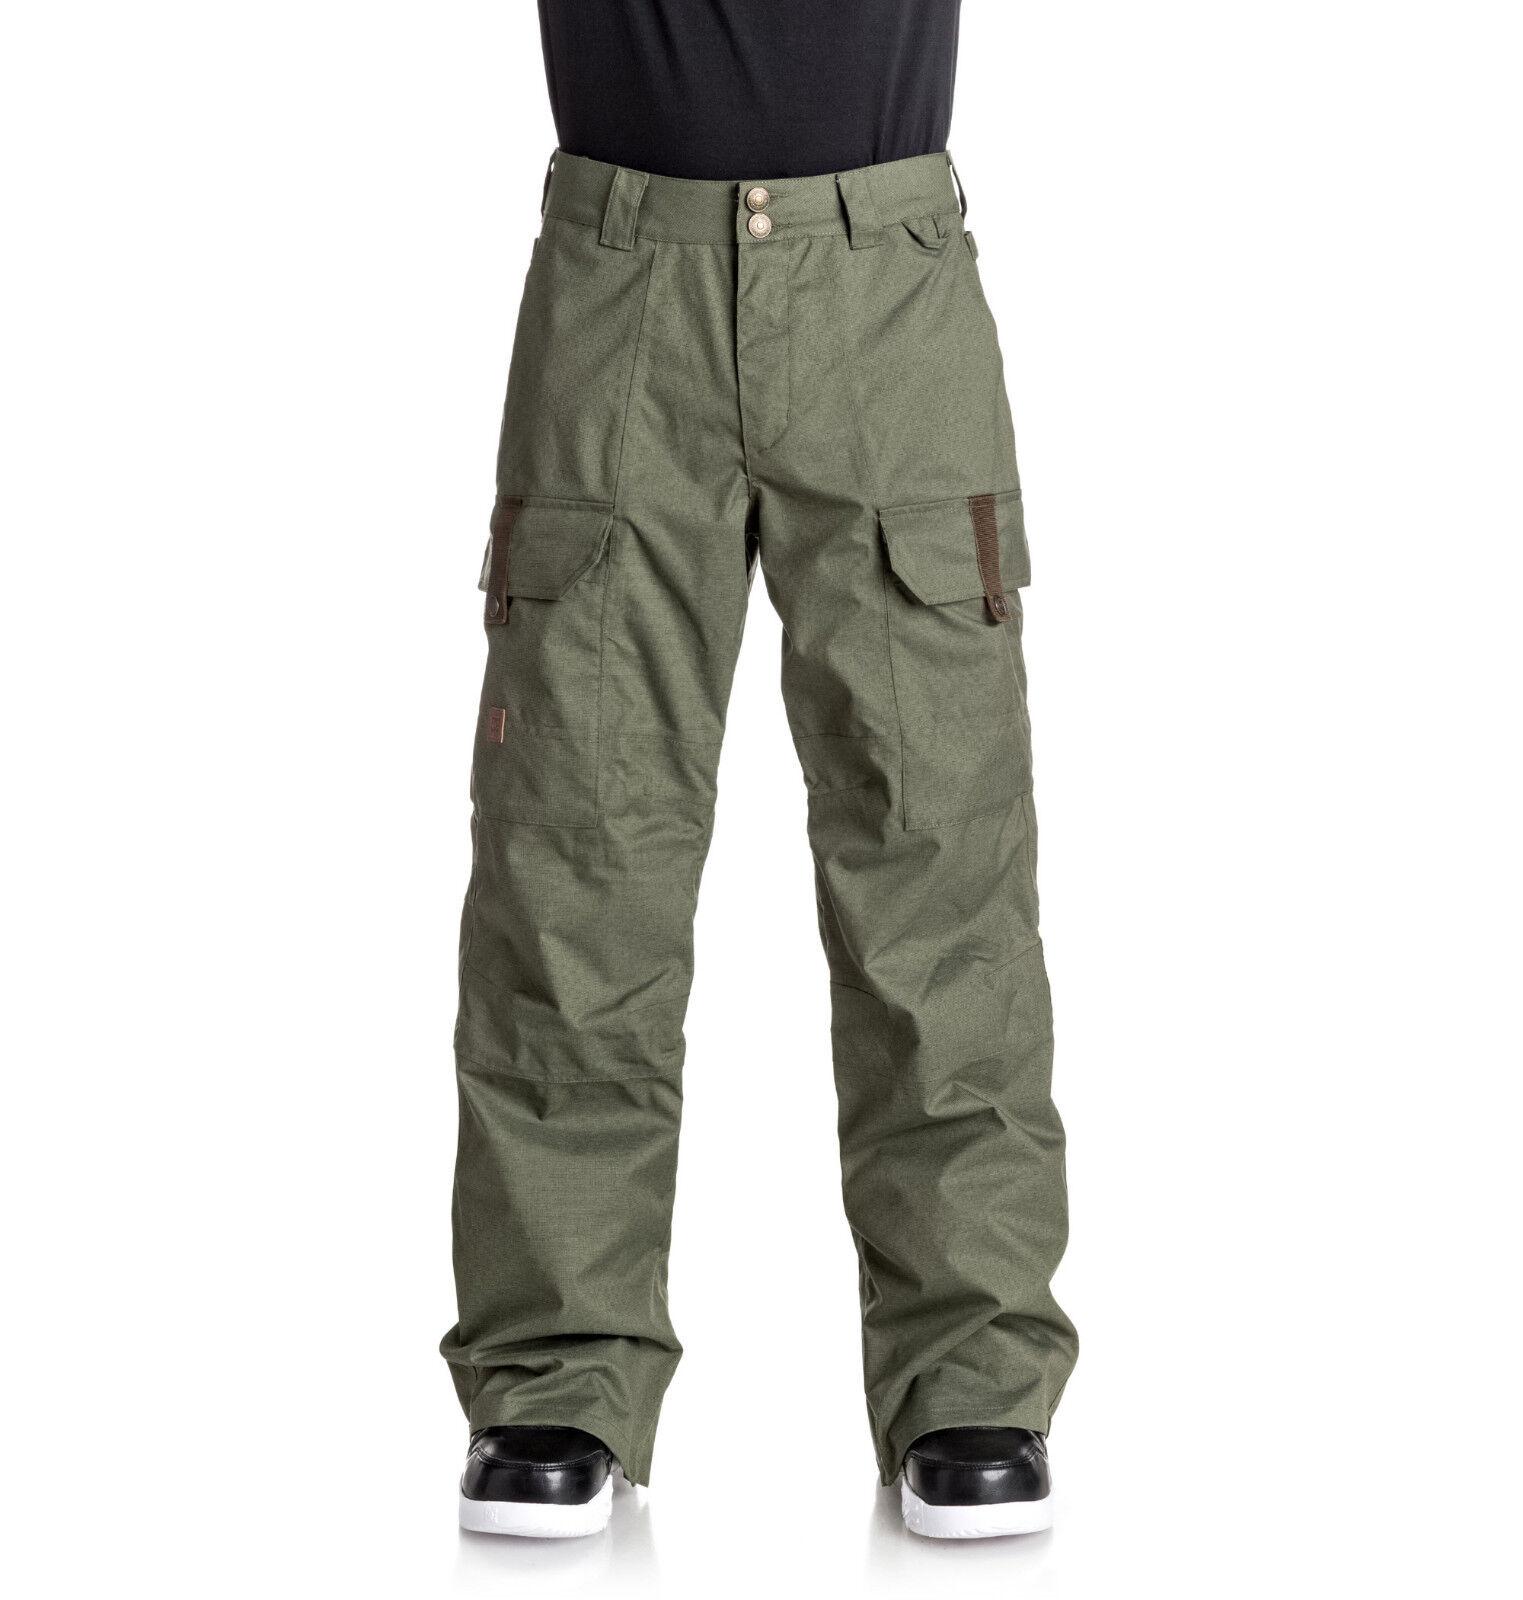 DC Men's CODE Snow Pants - KRP0 - Medium - NWT